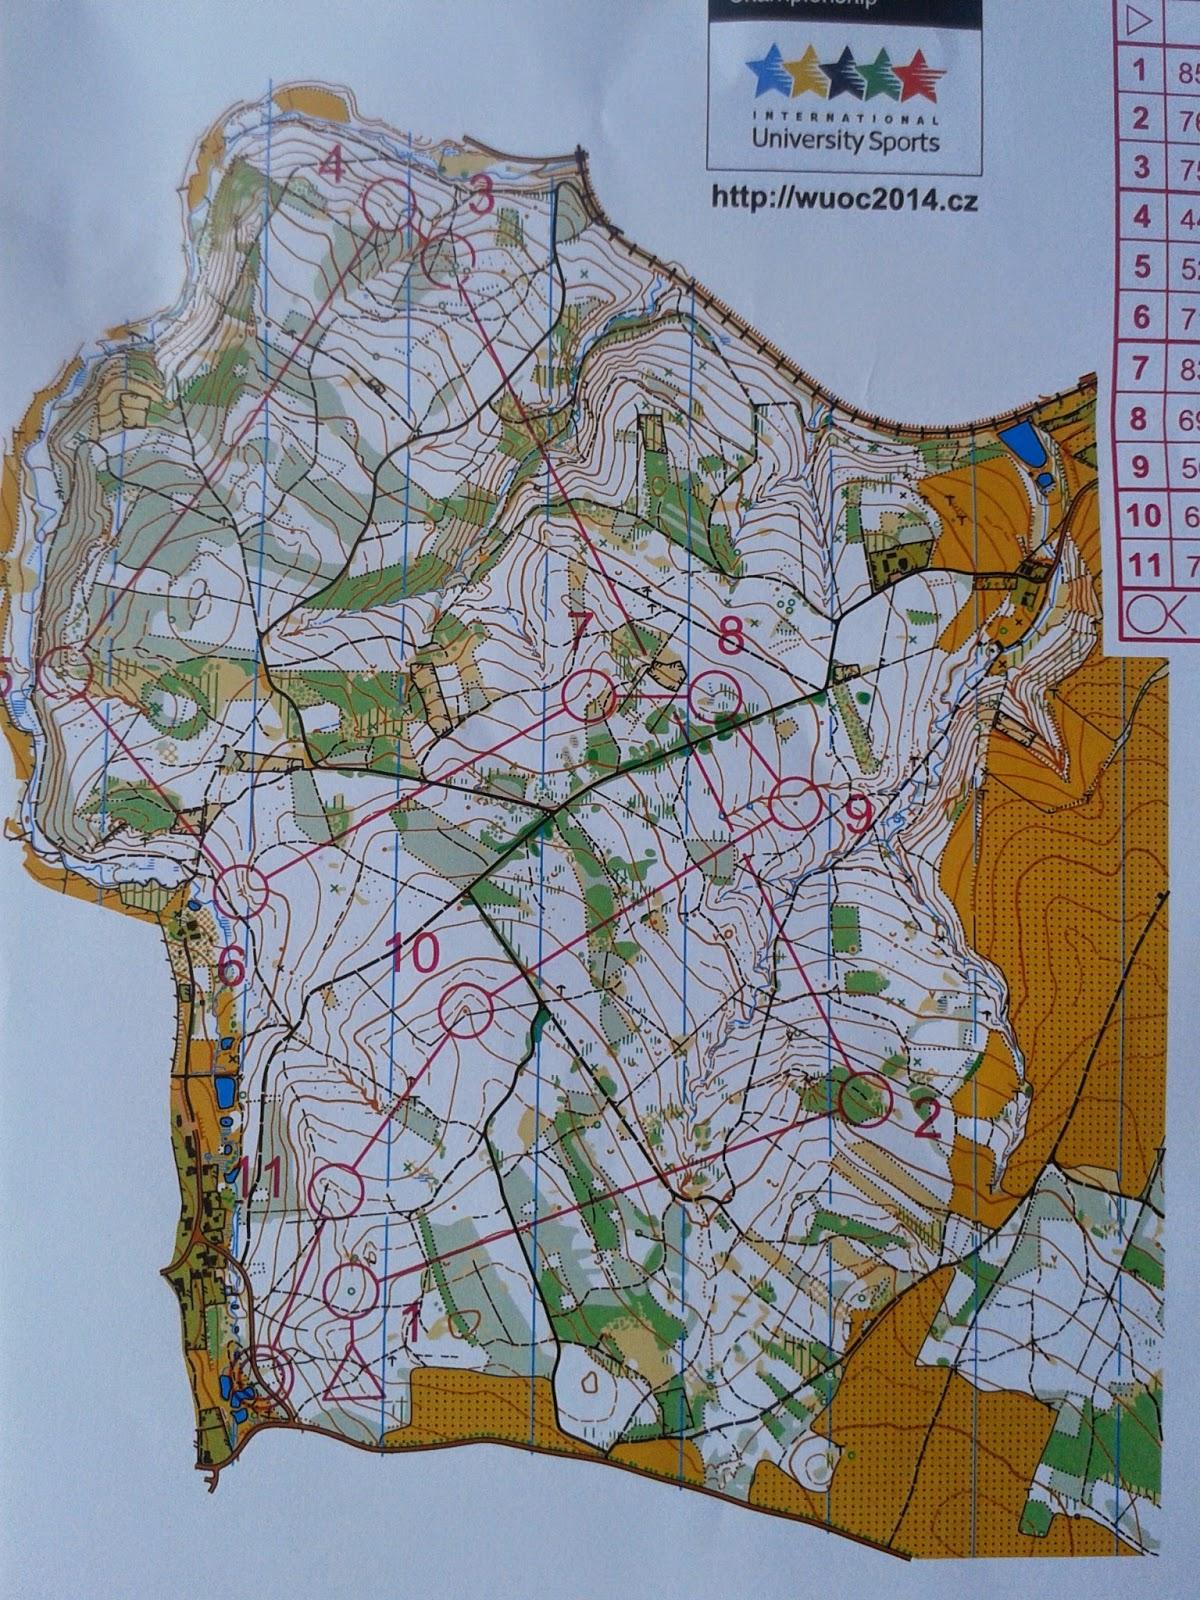 WUOC Long training map